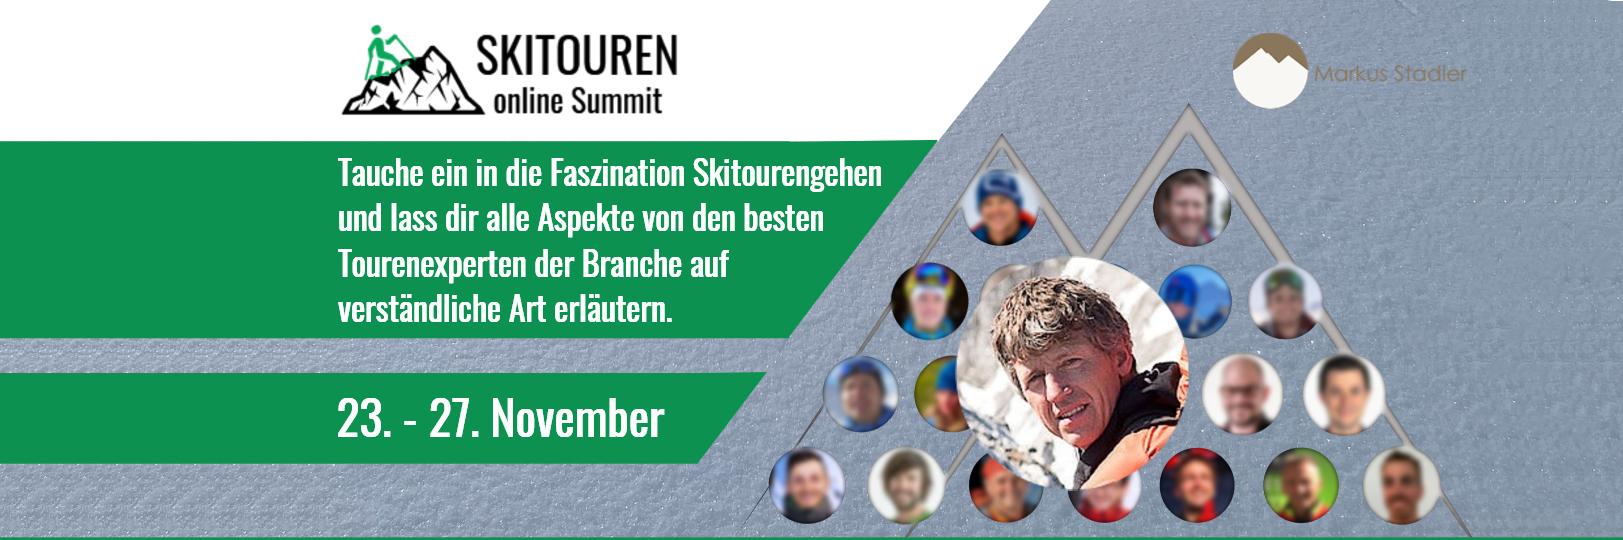 Skitouren-Online-Summit